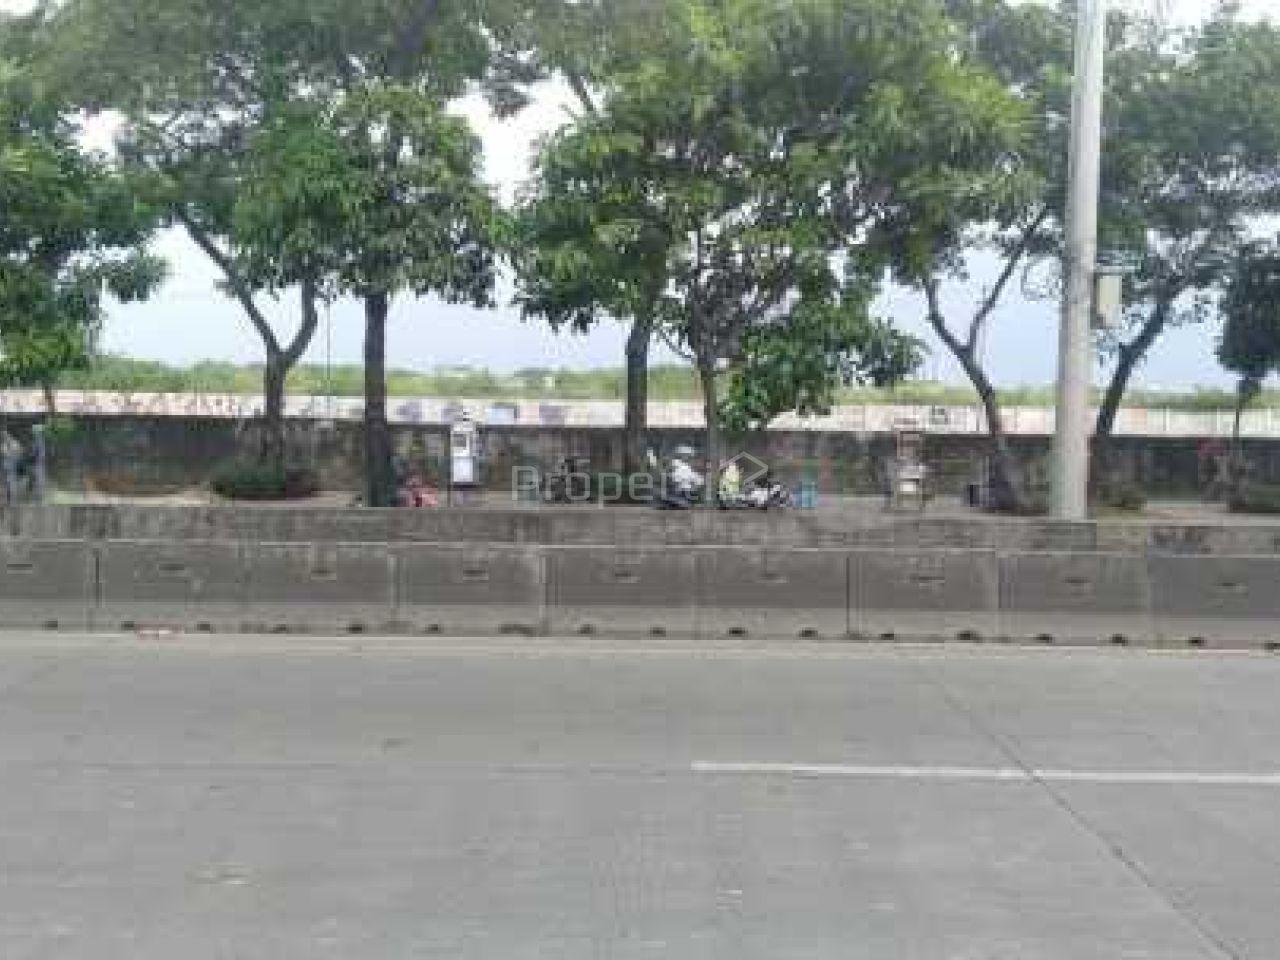 Lahan Komersial Zona K1 di Cengkareng, Jakarta Barat, Cengkareng